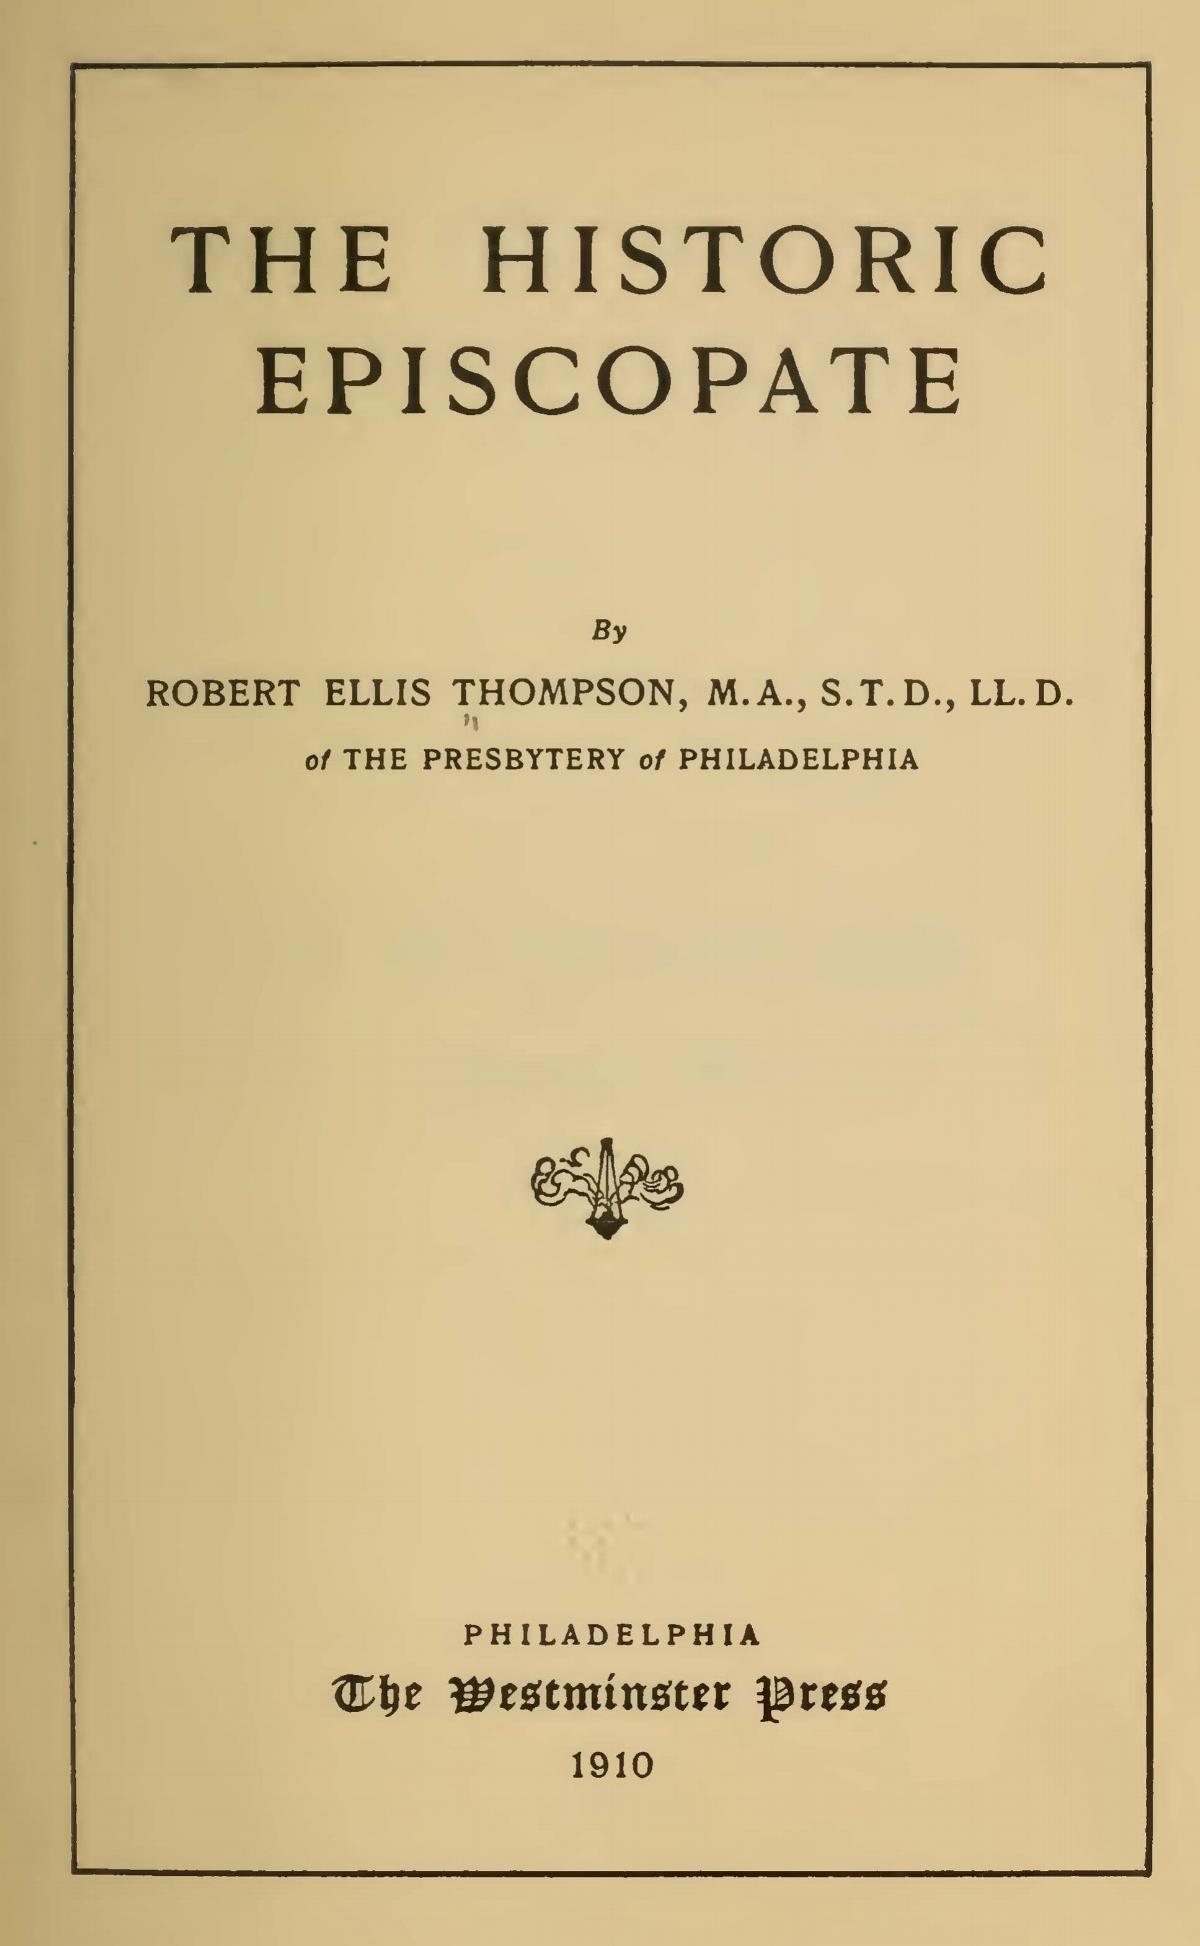 Thompson, Robert Ellis, The Historic Episcopate Title Page.jpg